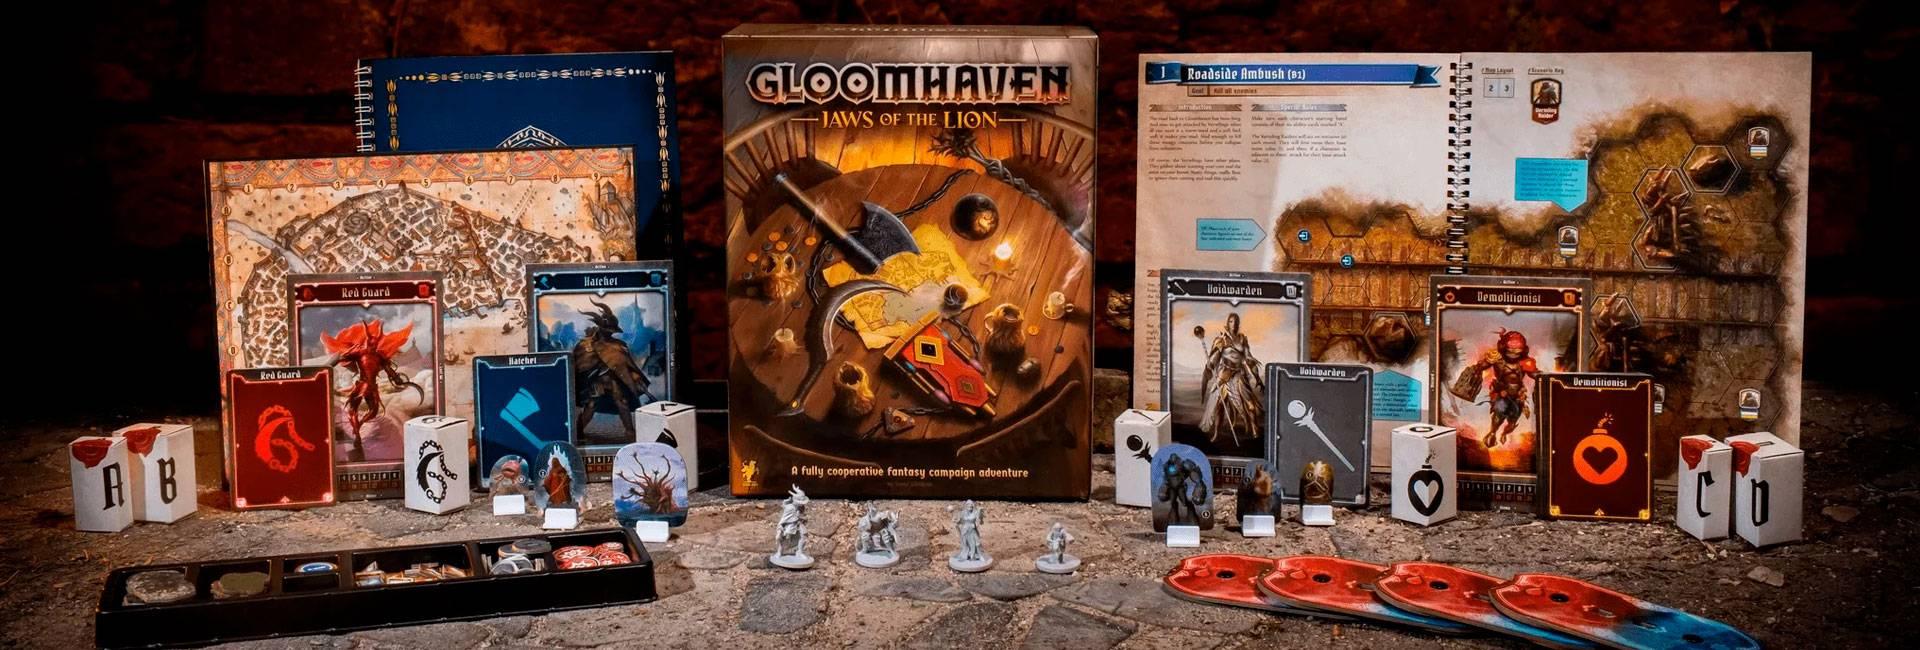 Gloomhaven: Fauces del León